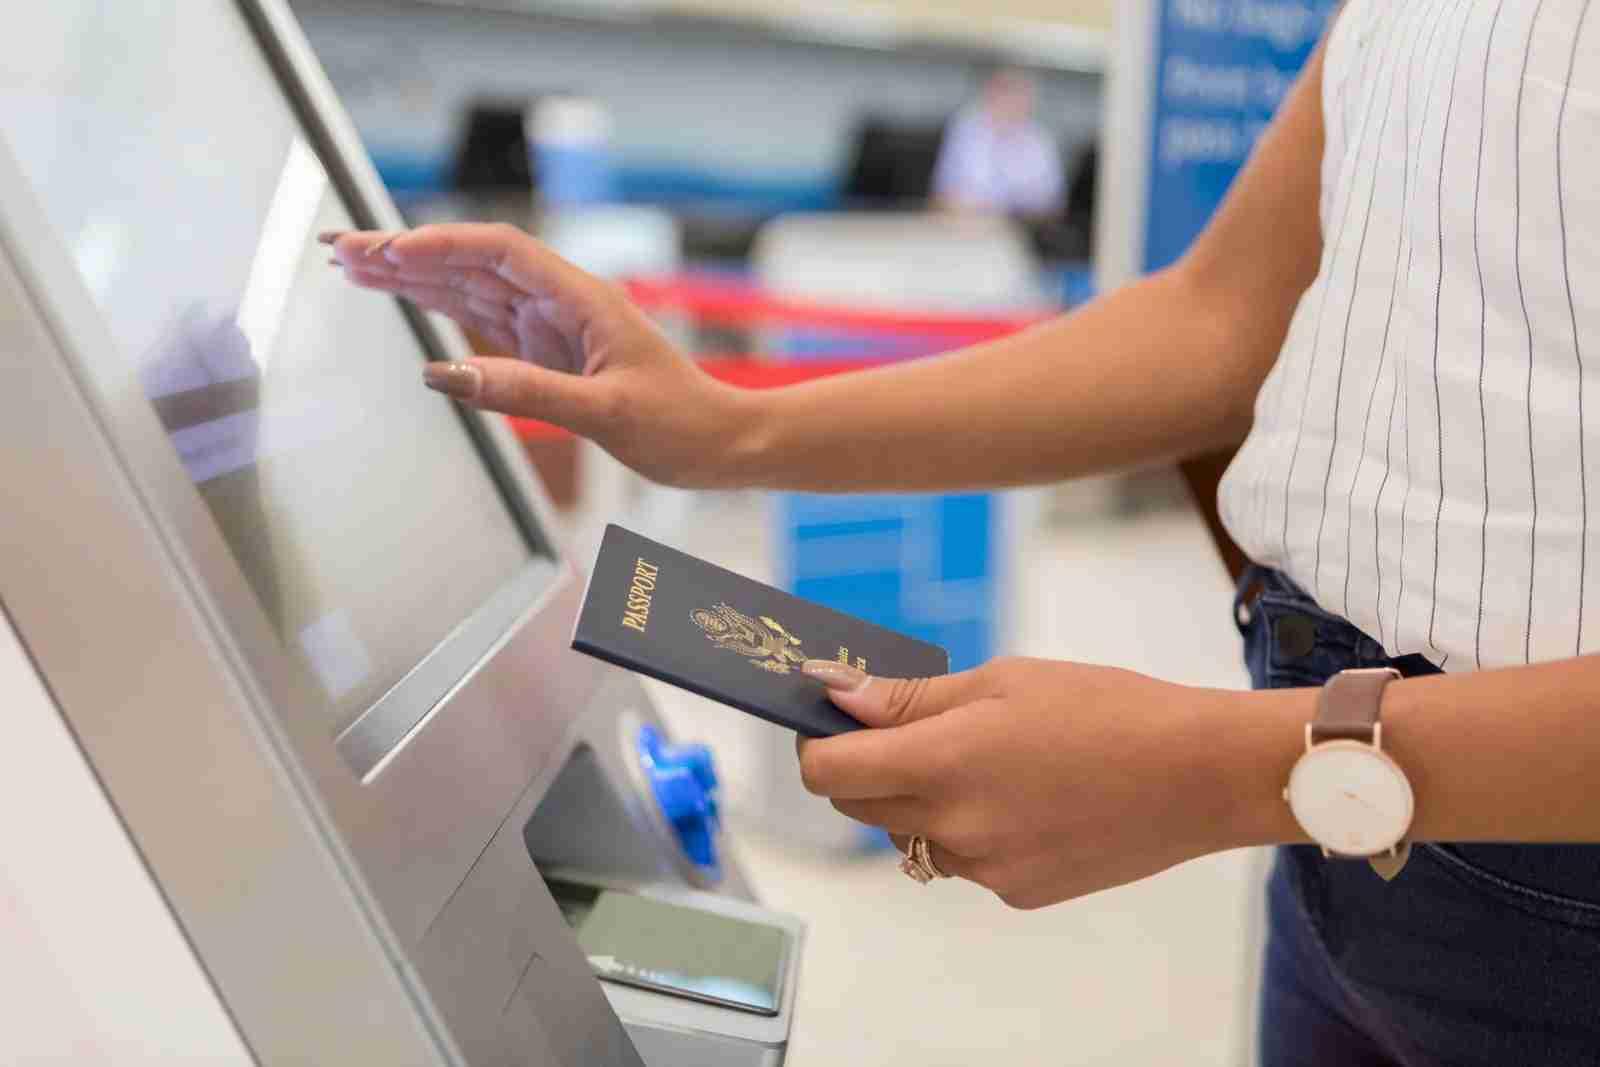 Airport Customs Checkin Kiosk with US Passport